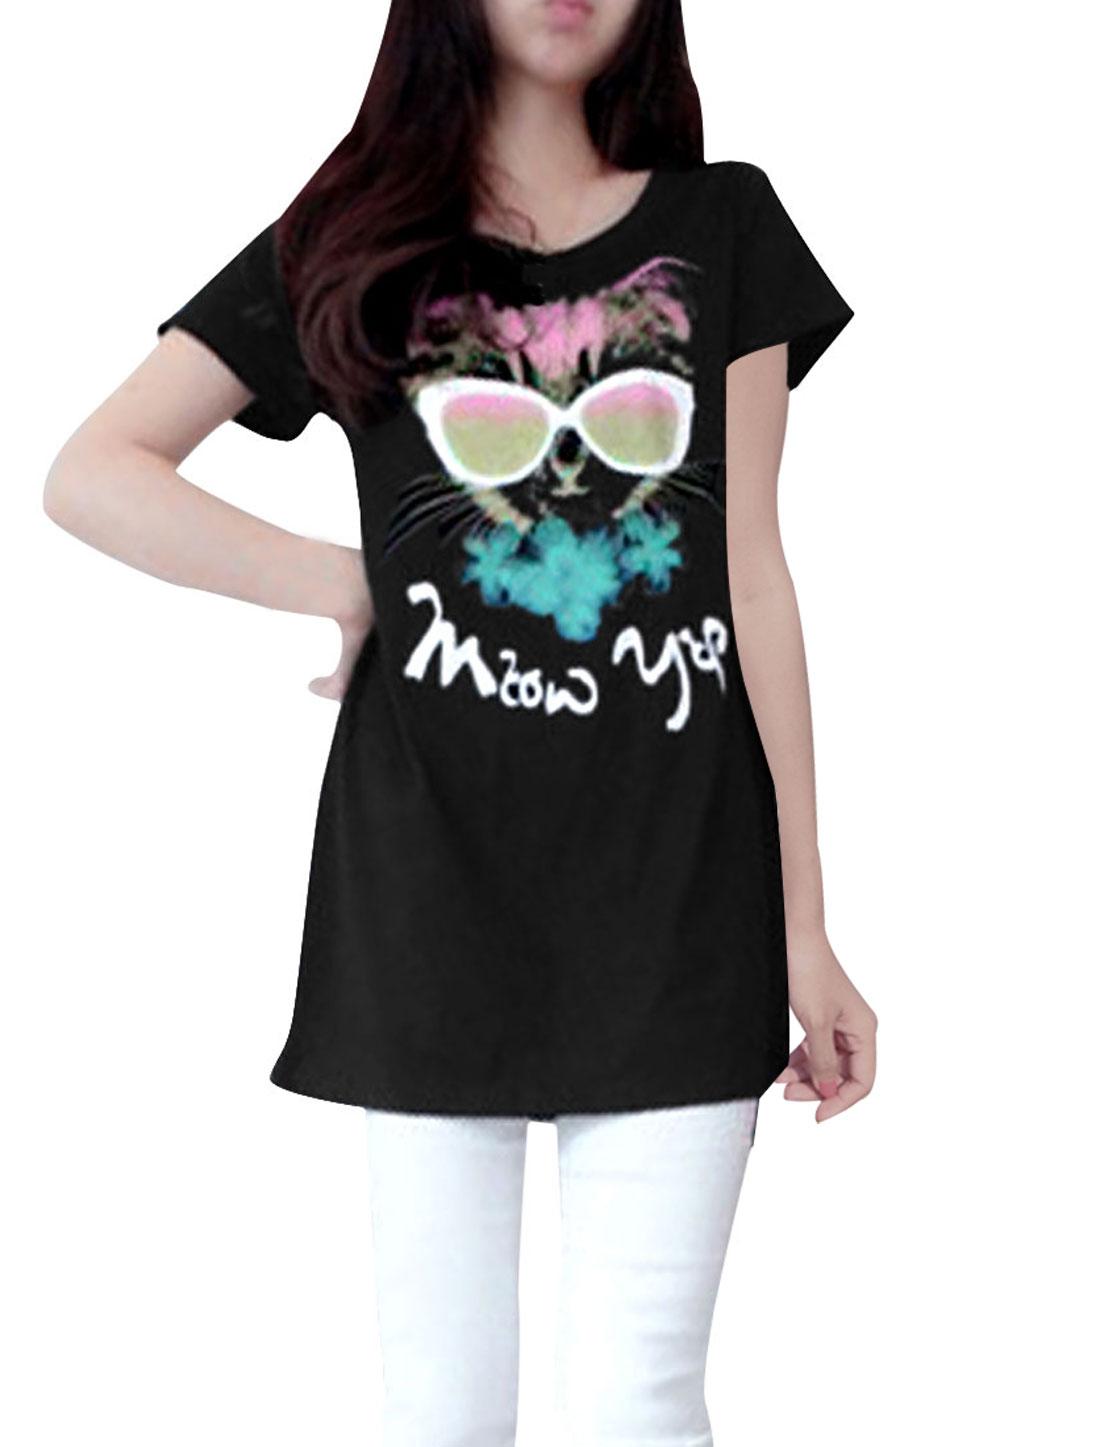 Ladies Chic Round Neck Short Sleeve Cartoon Cat Pattern Black Tunic Shirt XS